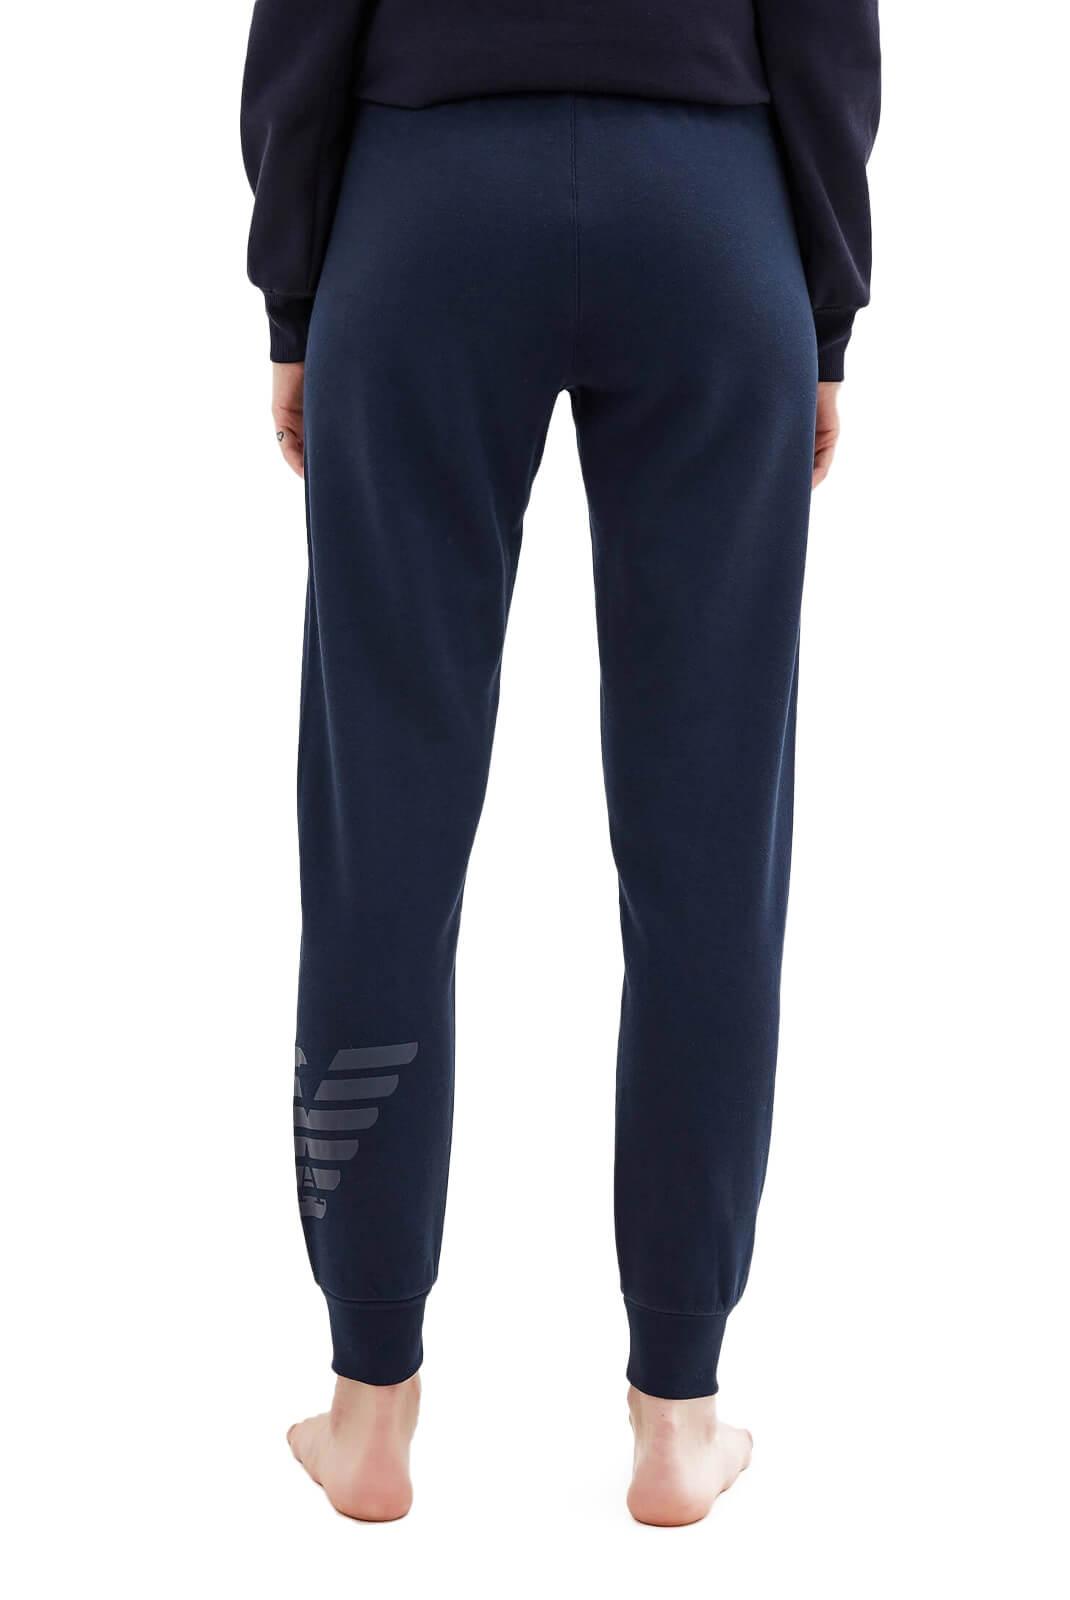 Pantalons  Emporio armani 163774 9A265 00135 BLEU